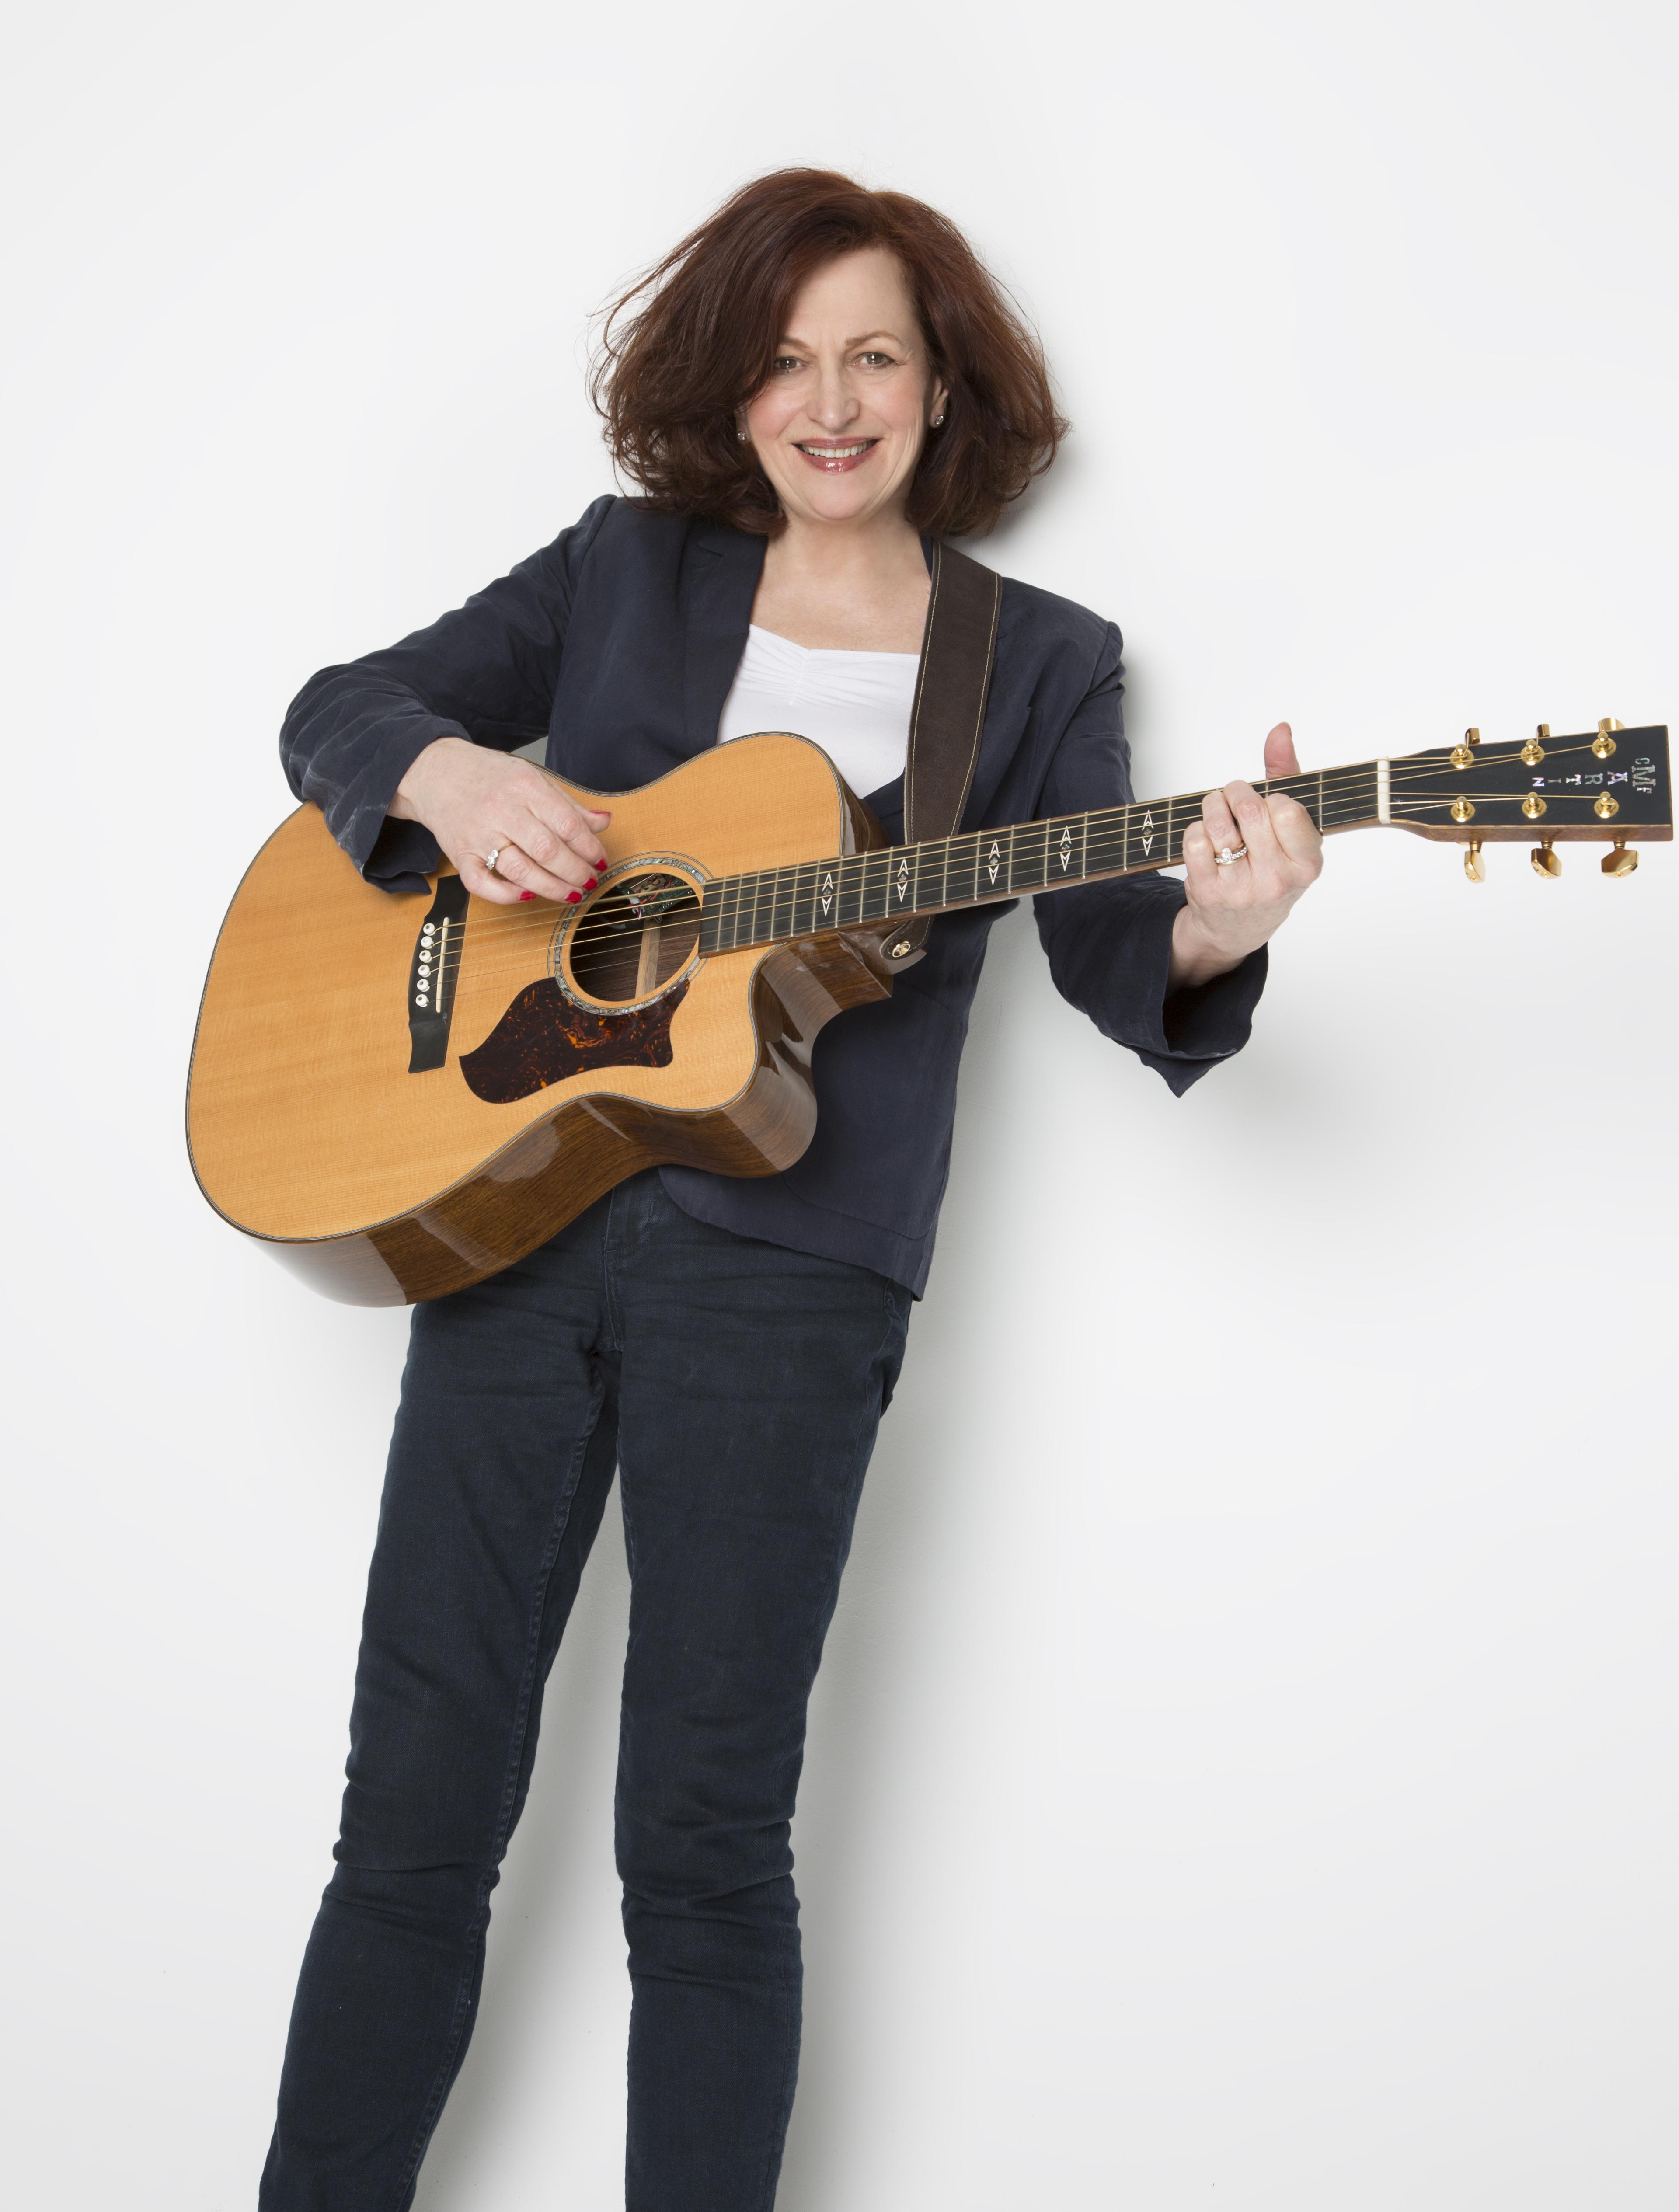 Barbara Dickson Standing With Guitar 2016CREDIT